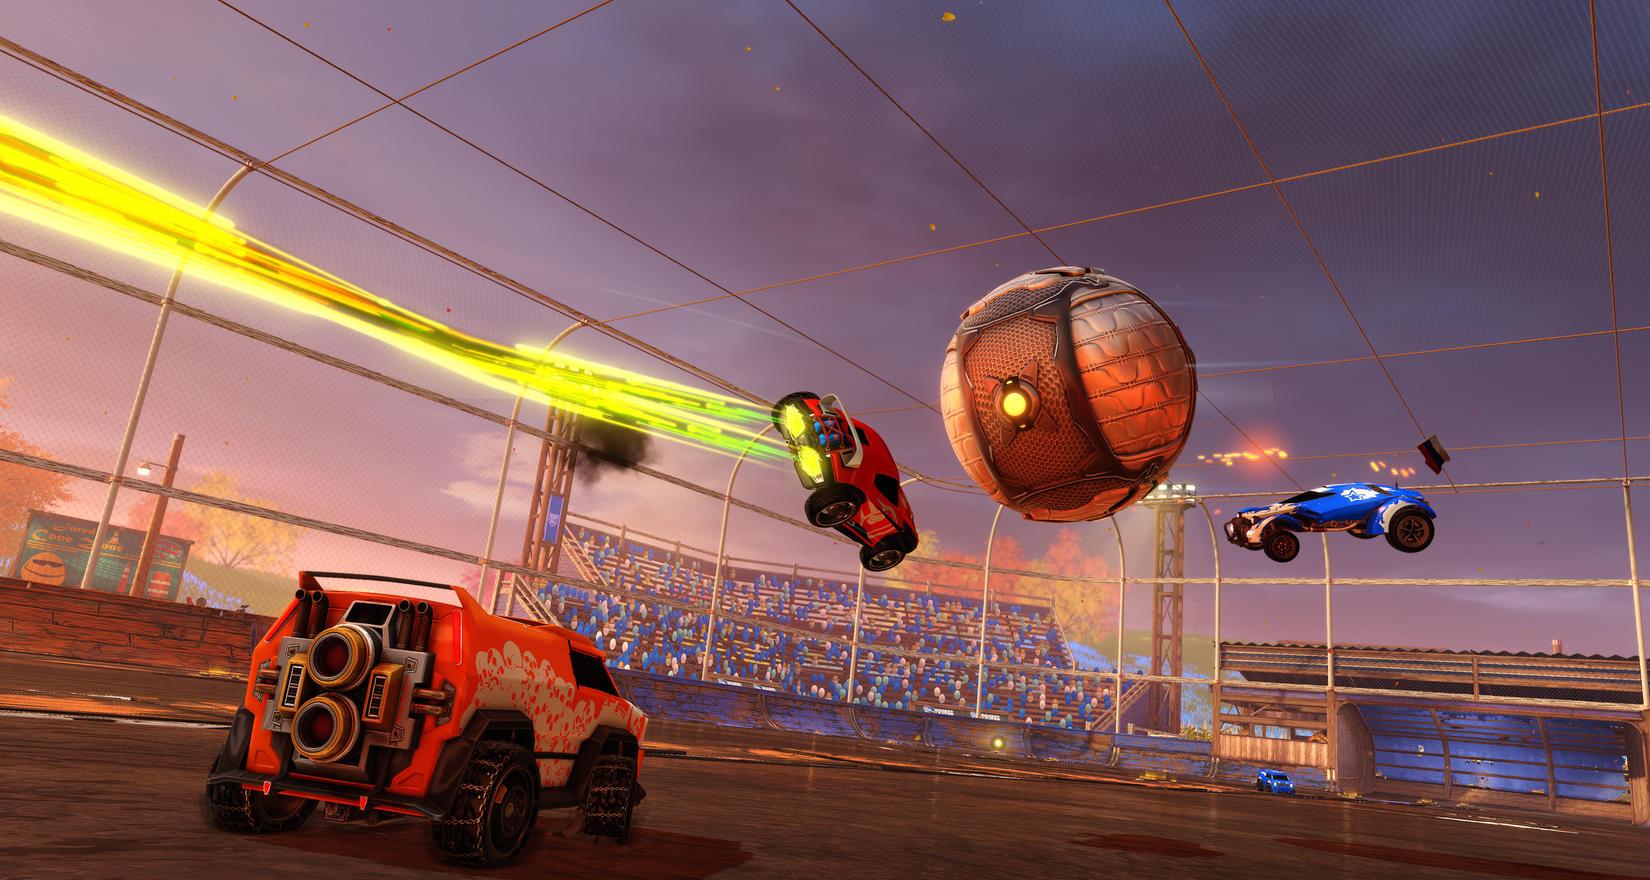 Rocket League's New Cross-Play Feature Won't Arrive Until 2019, Developers Say